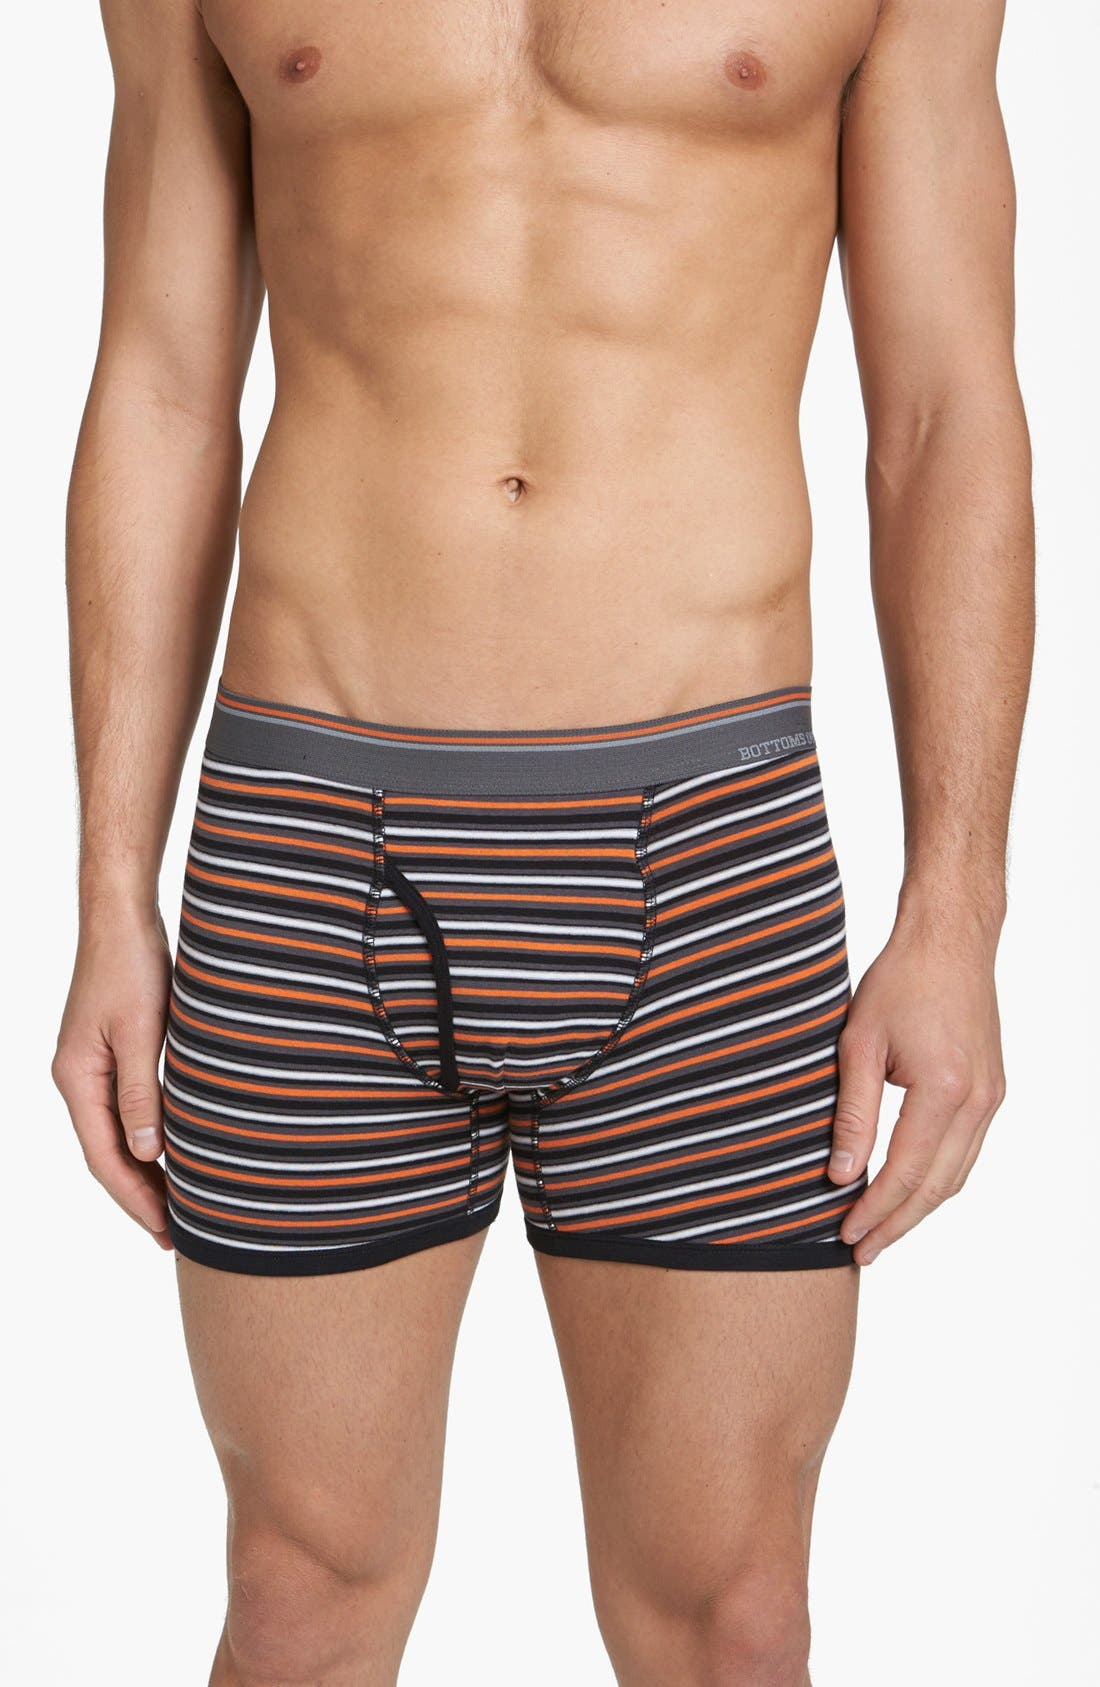 Alternate Image 3  - Basic Underwear 'Bottoms Out' Stripe Boxer Briefs (3-Pack)